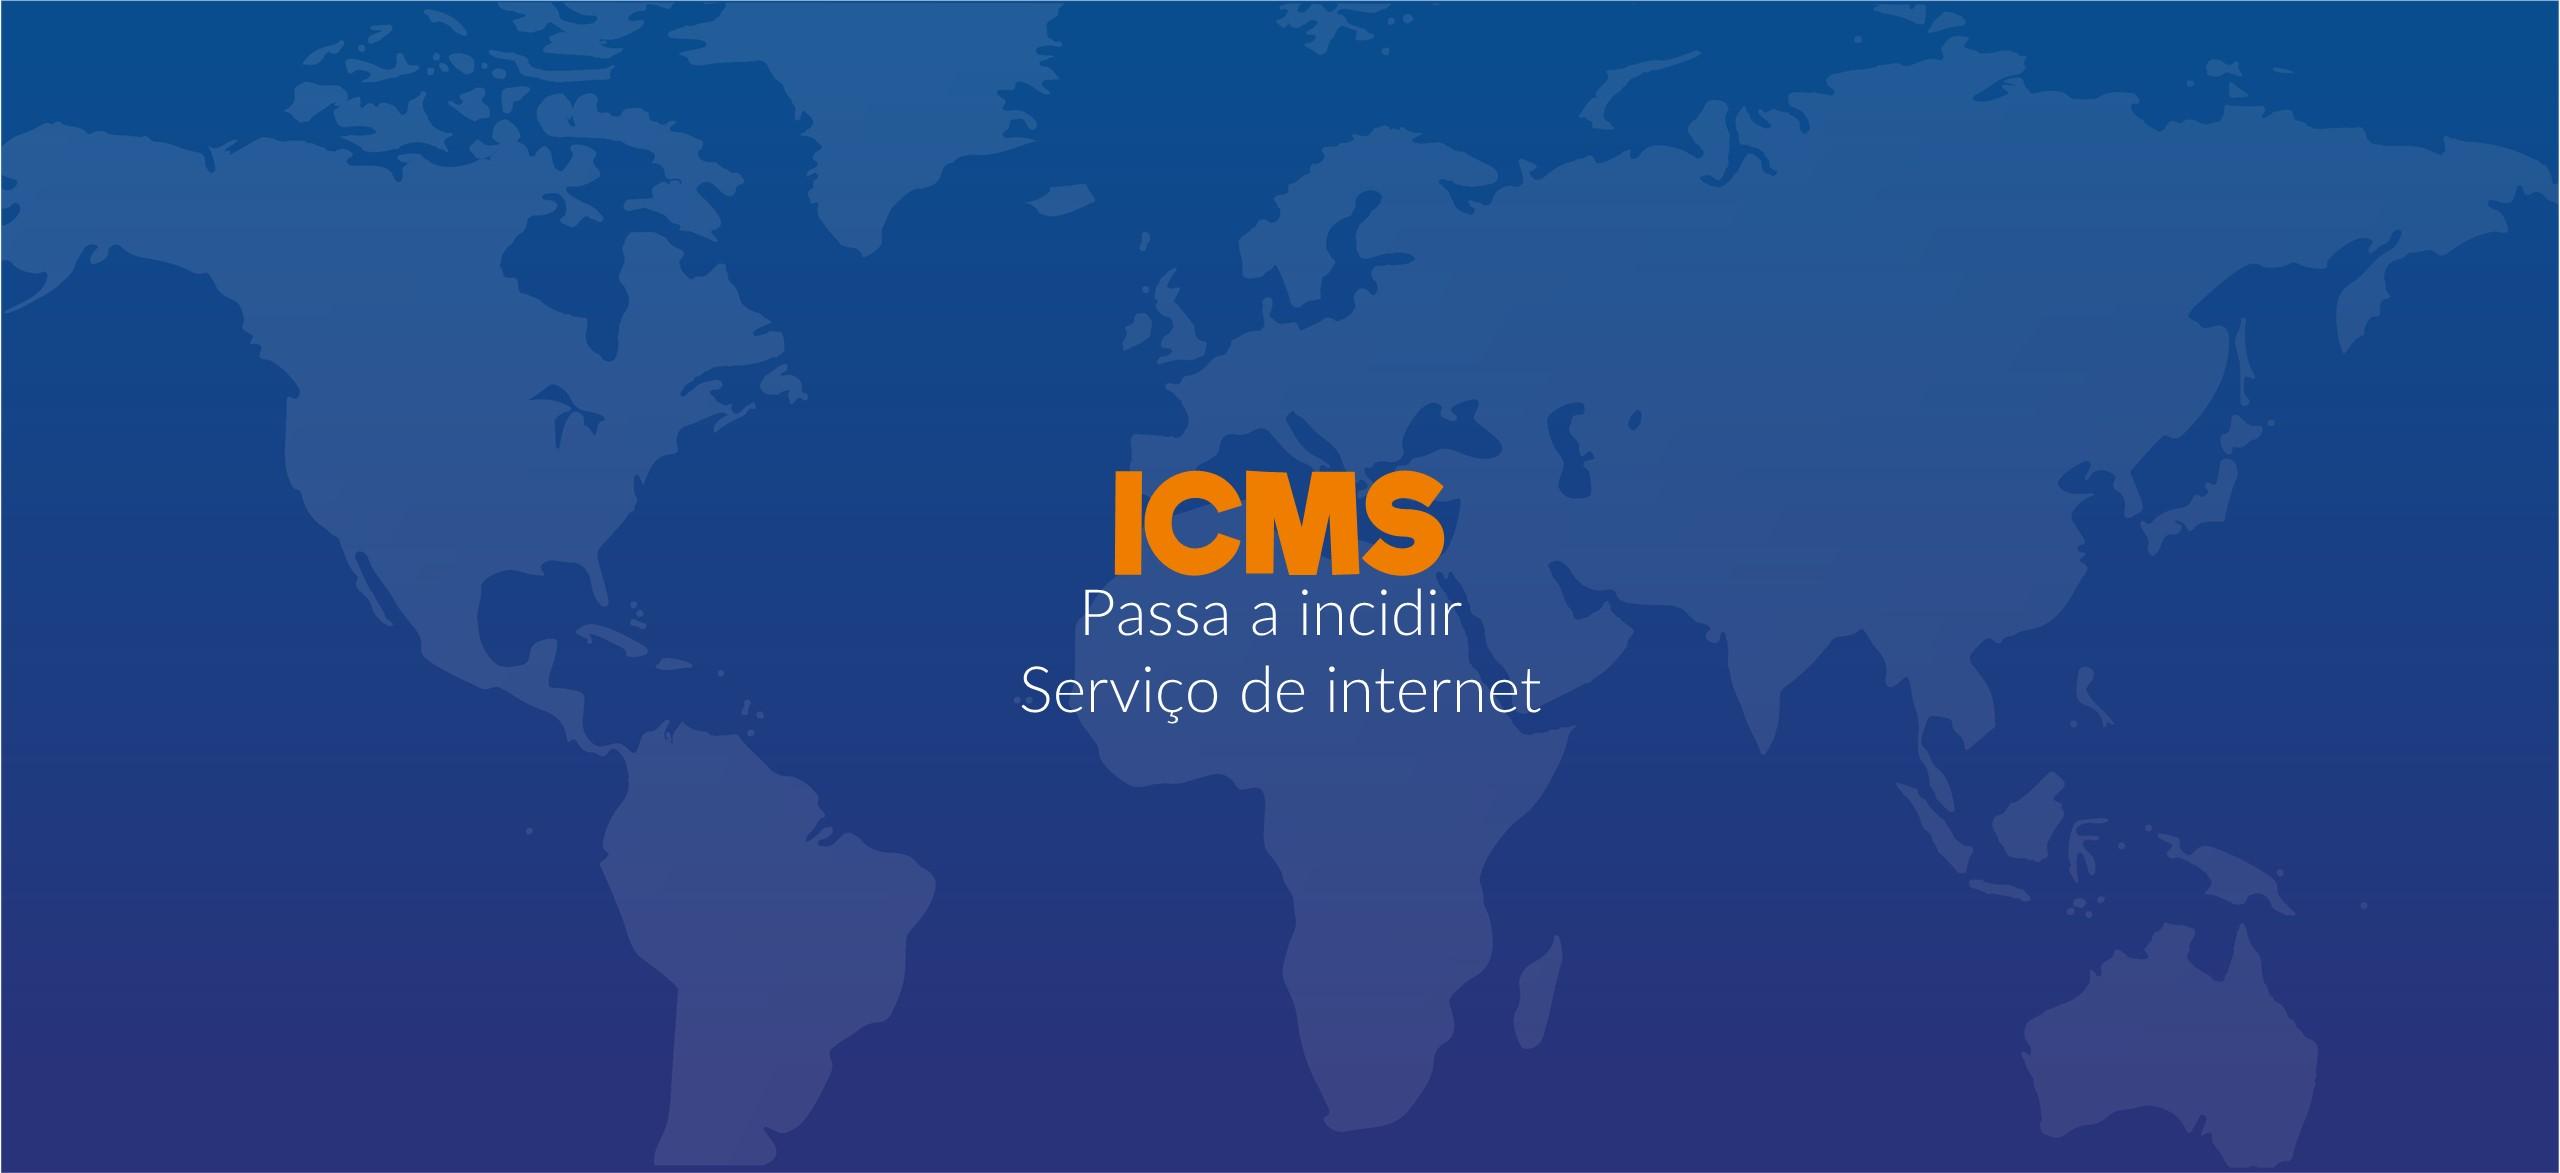 ICMS passa a incidir sobre serviço de INTERNET